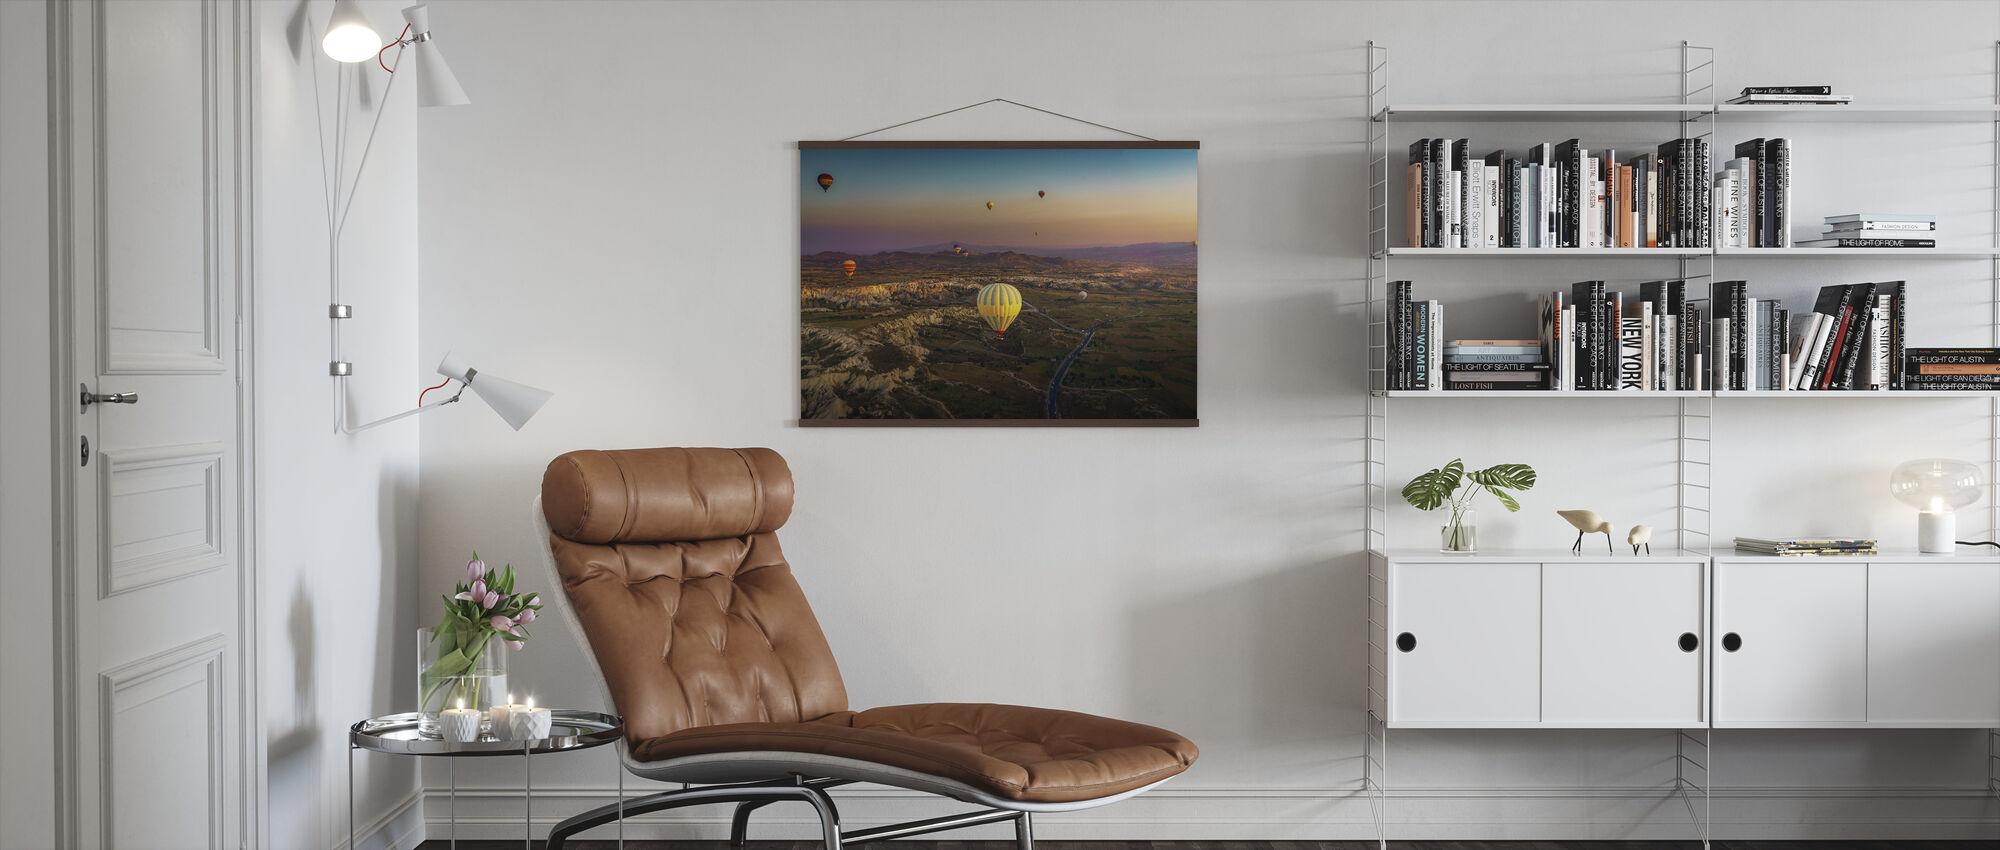 Zero Gravity - Poster - Living Room